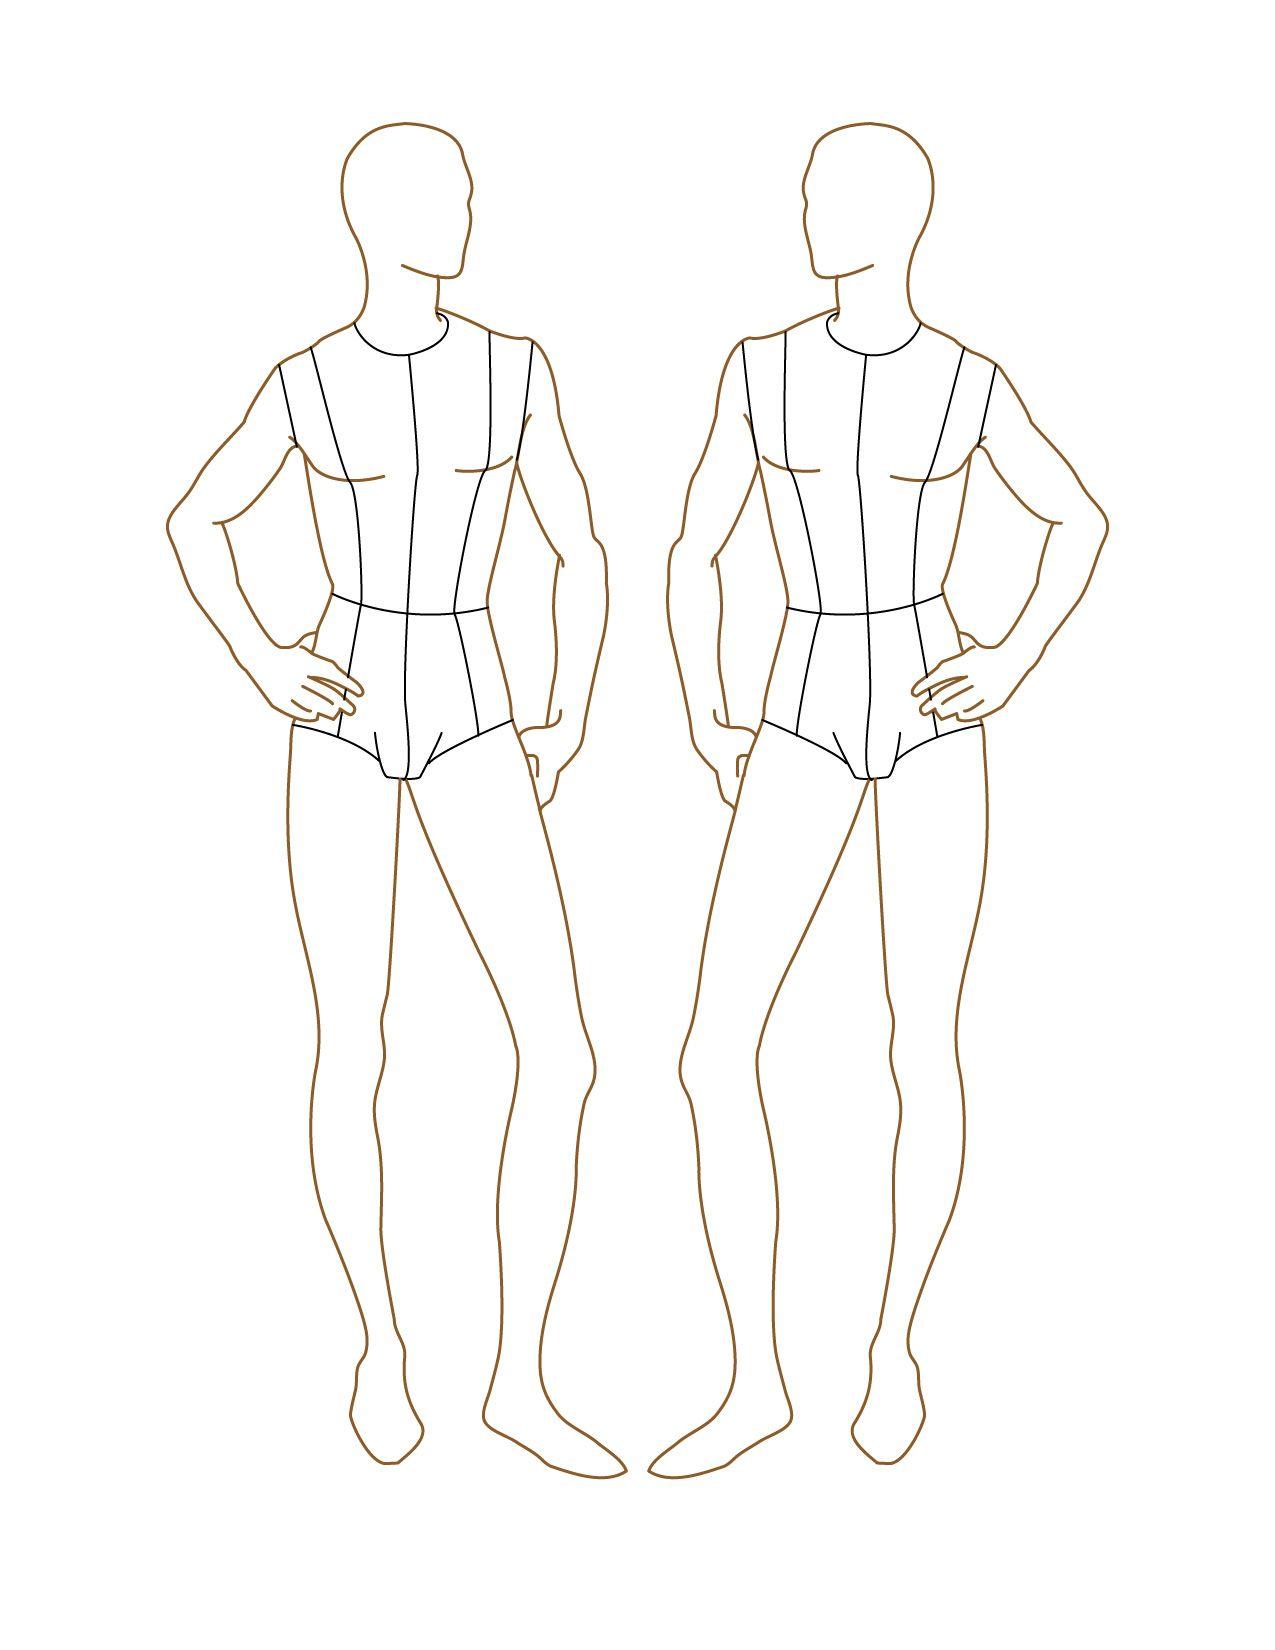 Croqui Fashion Model Templates | Male Fashion Croquis | Fashion ...